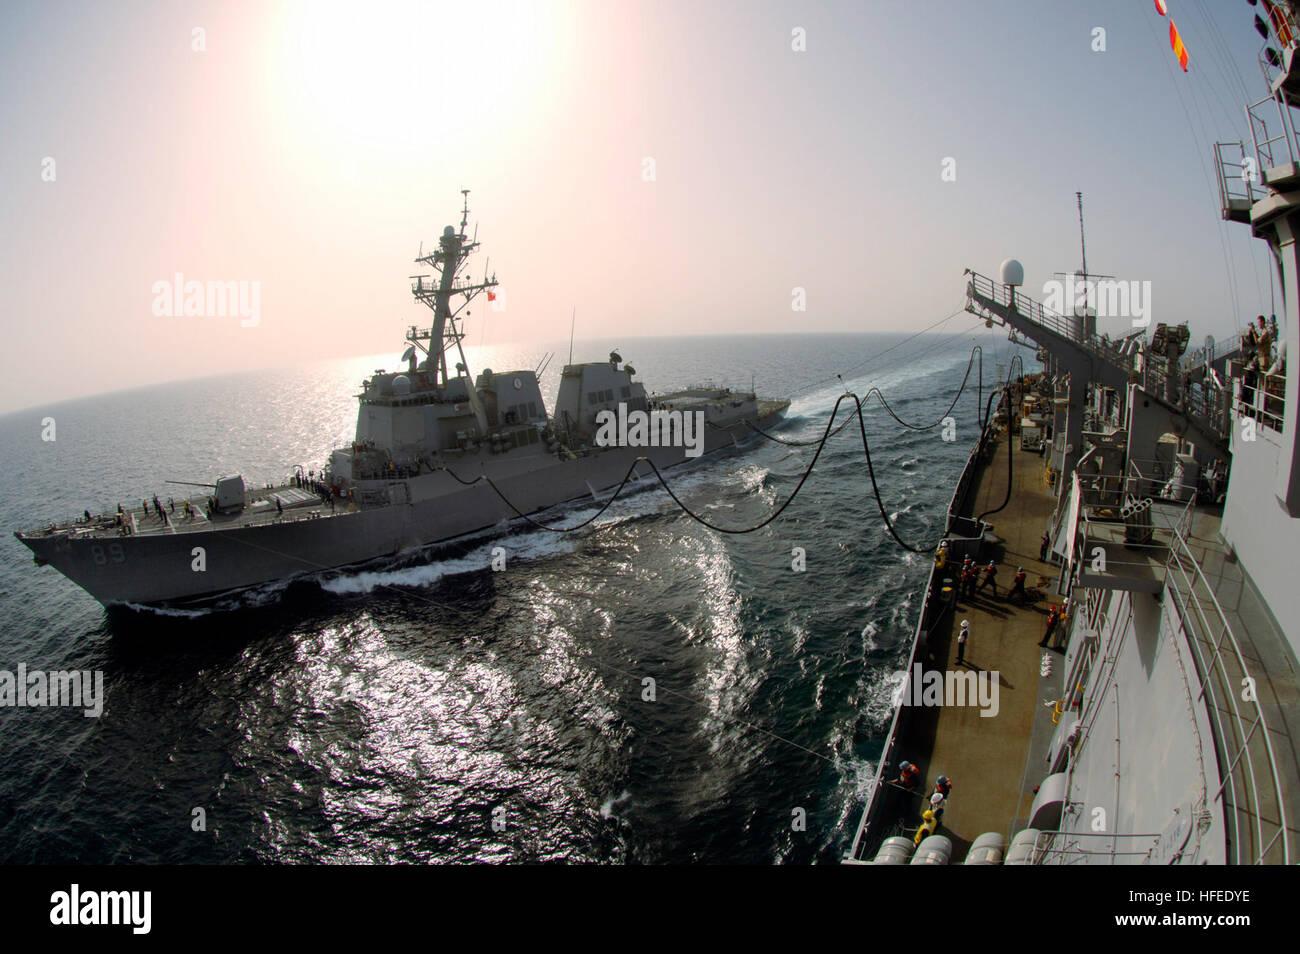 050604-N-4309A-058 Persian Gulf (June 4, 2005) – The Arleigh Burke-class destroyer USS Mustin (DDG 89) cruises alongside - Stock Image